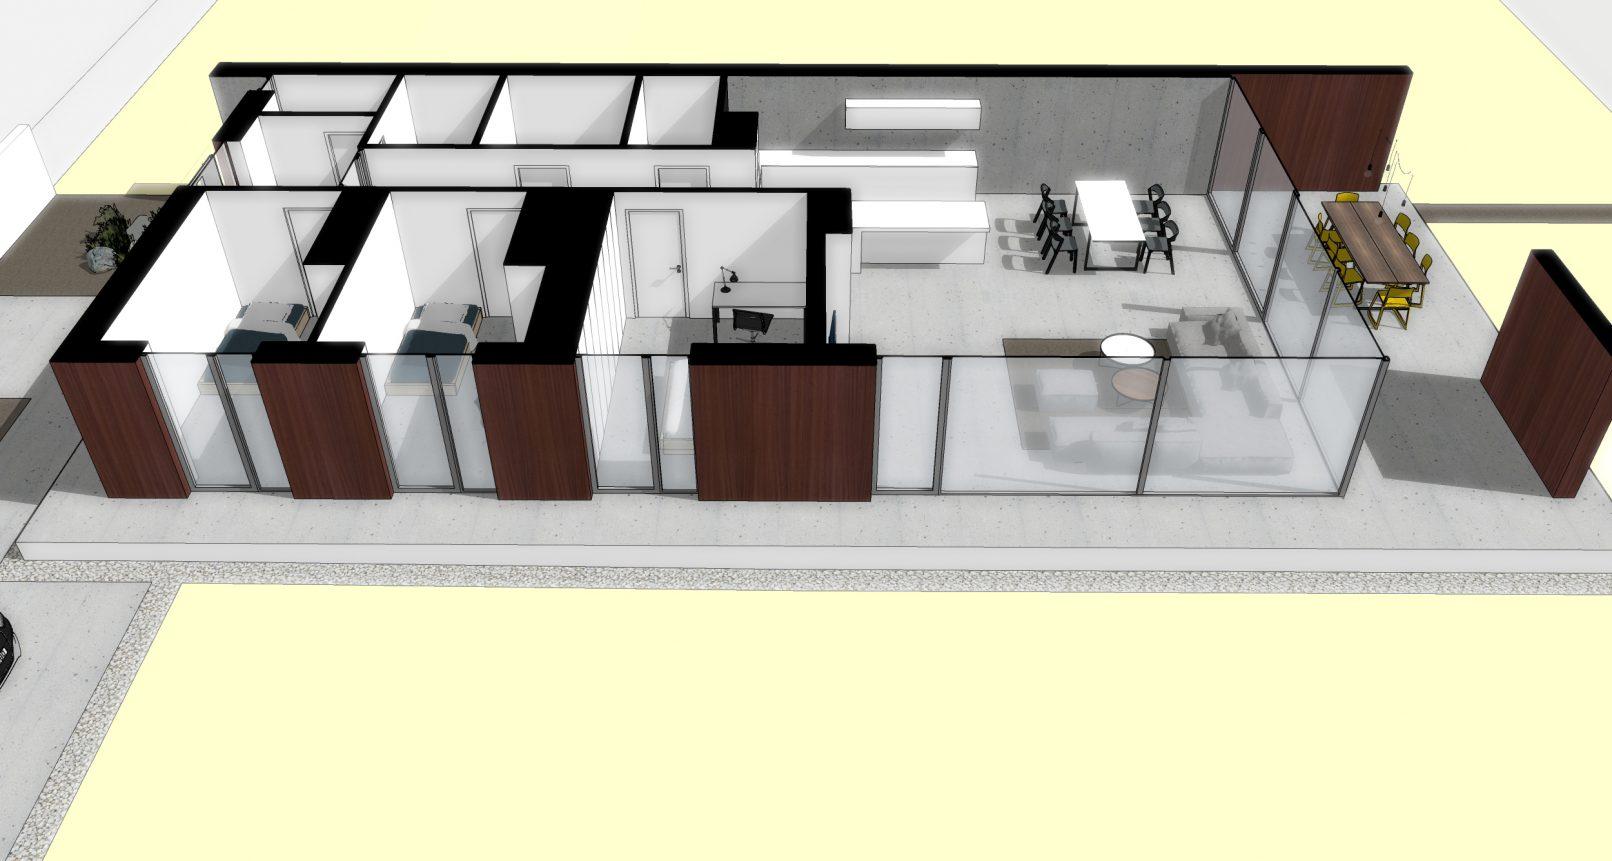 Dom - Obrázok č. 130